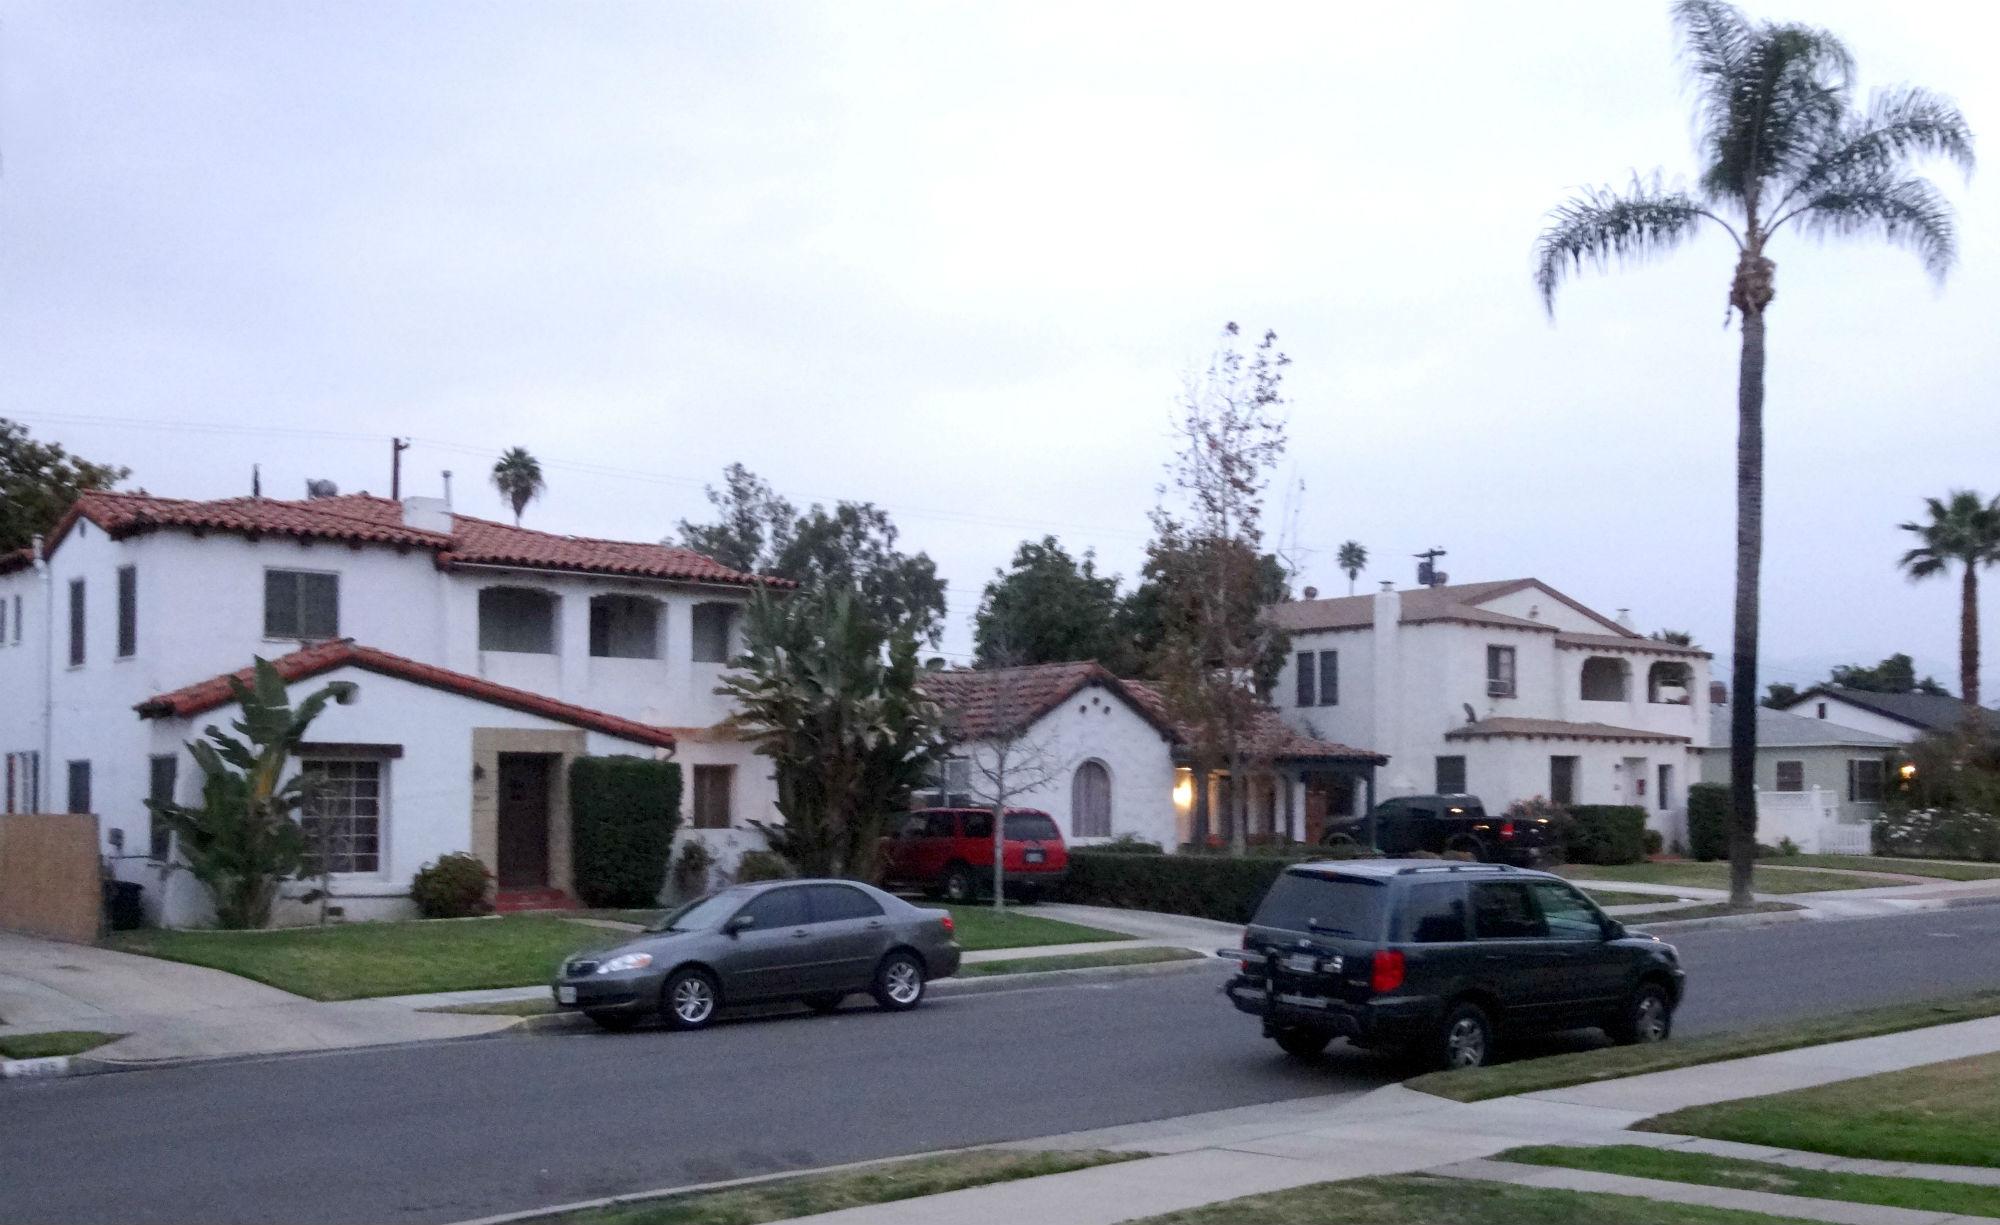 Beautiful neighboring homes on a quiet cul-de-sac street.